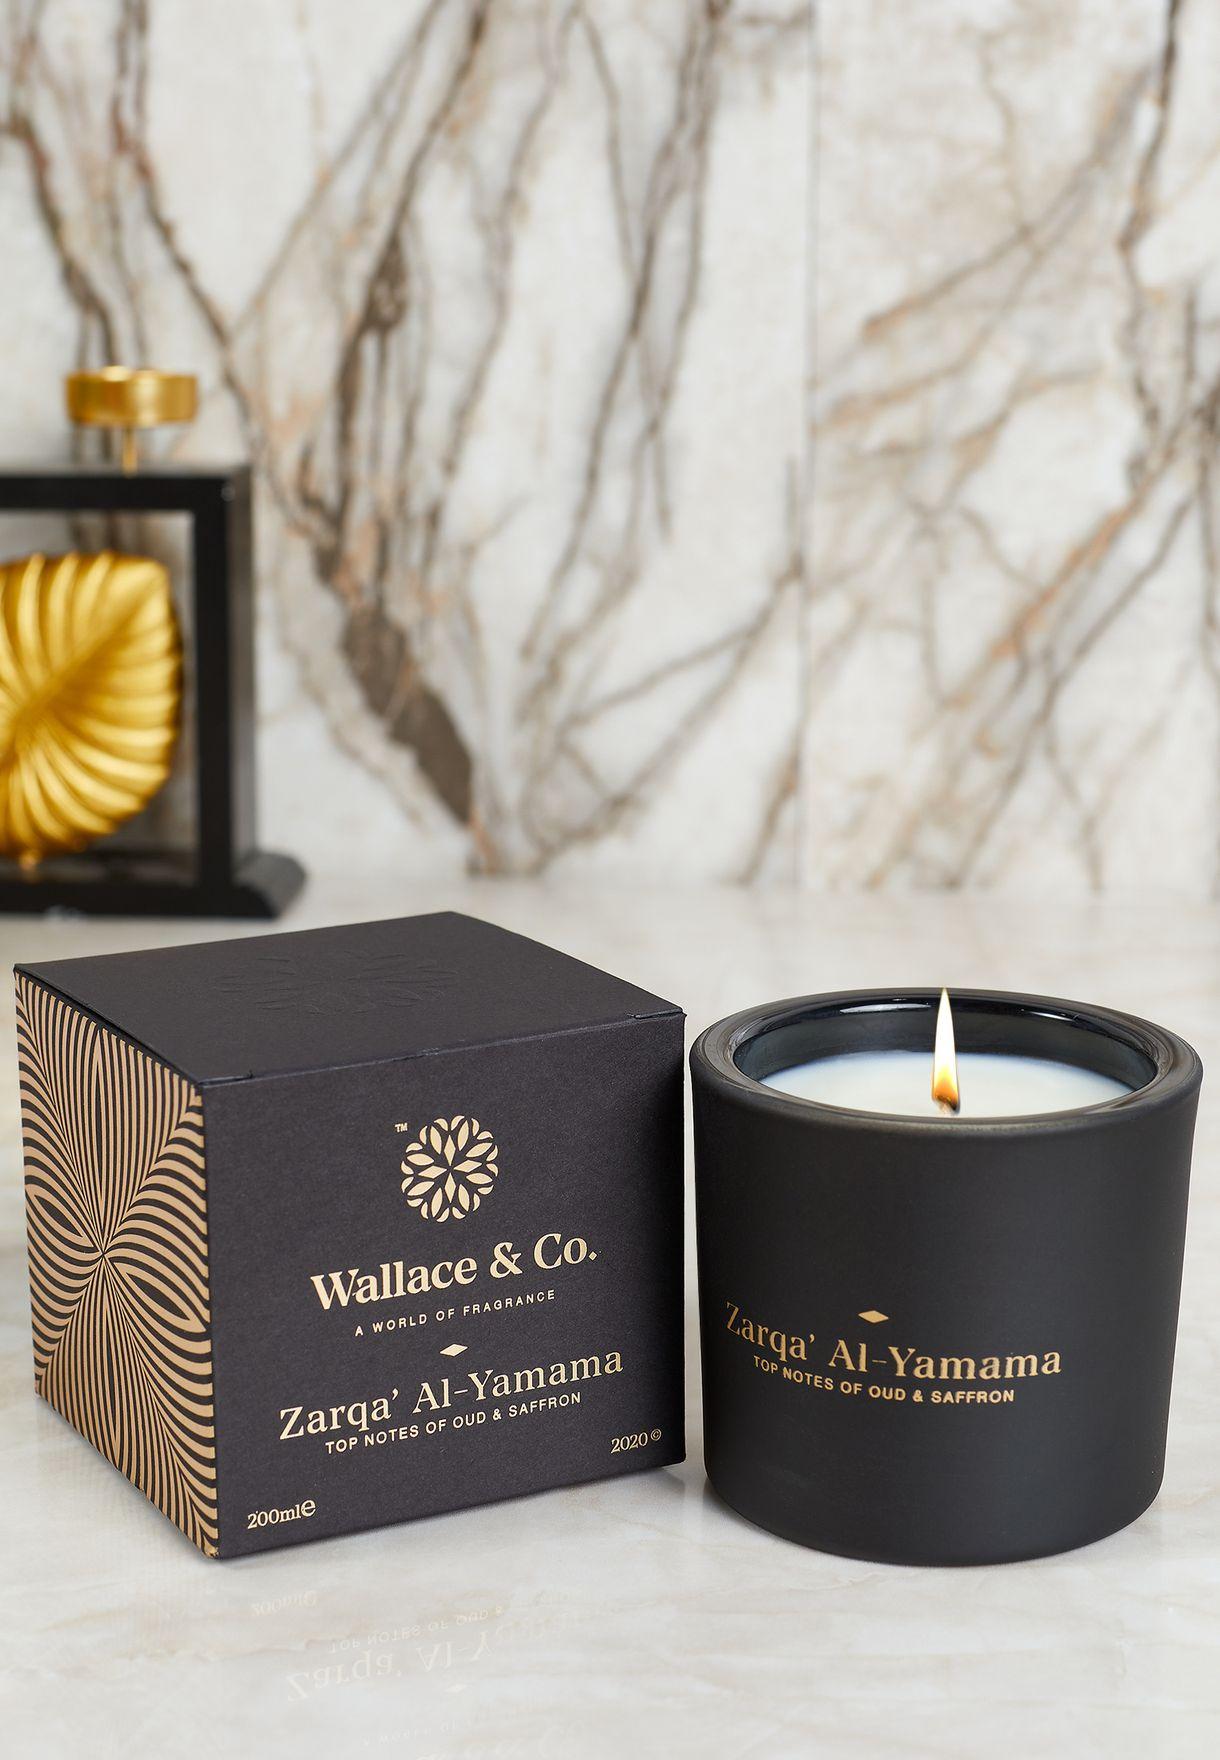 Oud & Saffron Zarqa' Al Yamama Scented Candle 200ml